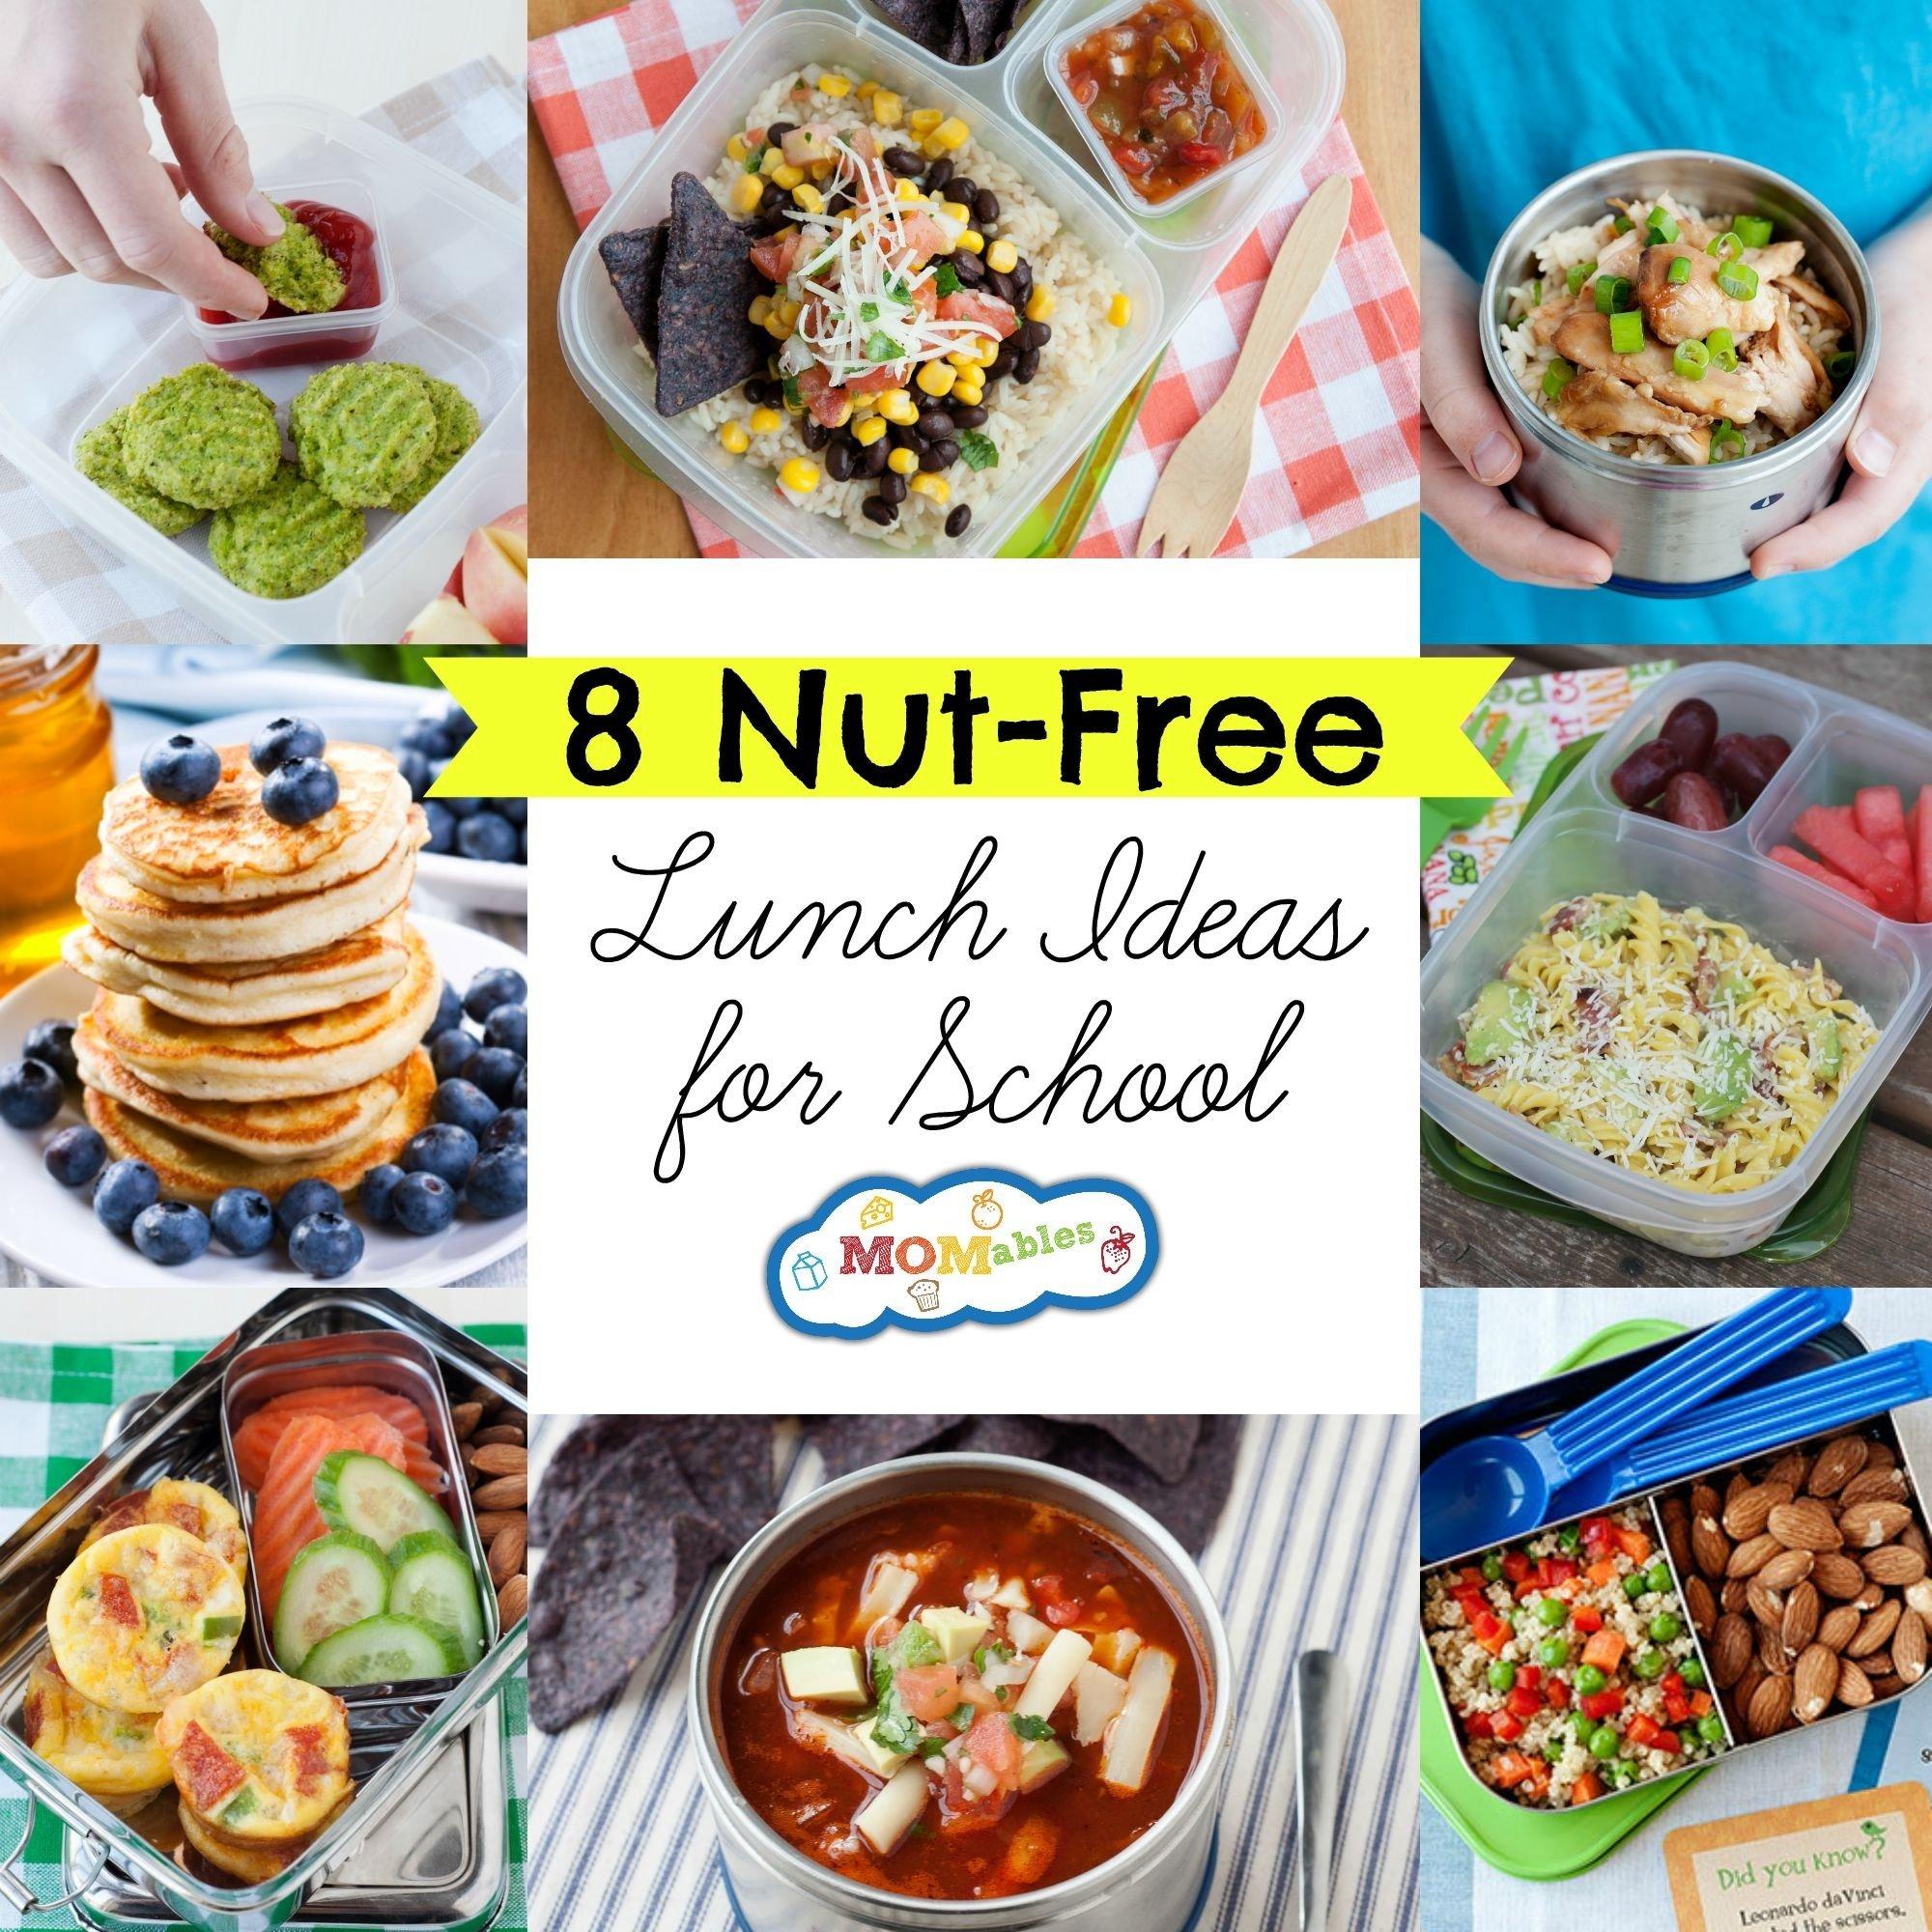 10 Pretty Gluten Free Lunch Ideas For Kids 7 gluten free lunch ideas for school momables 7